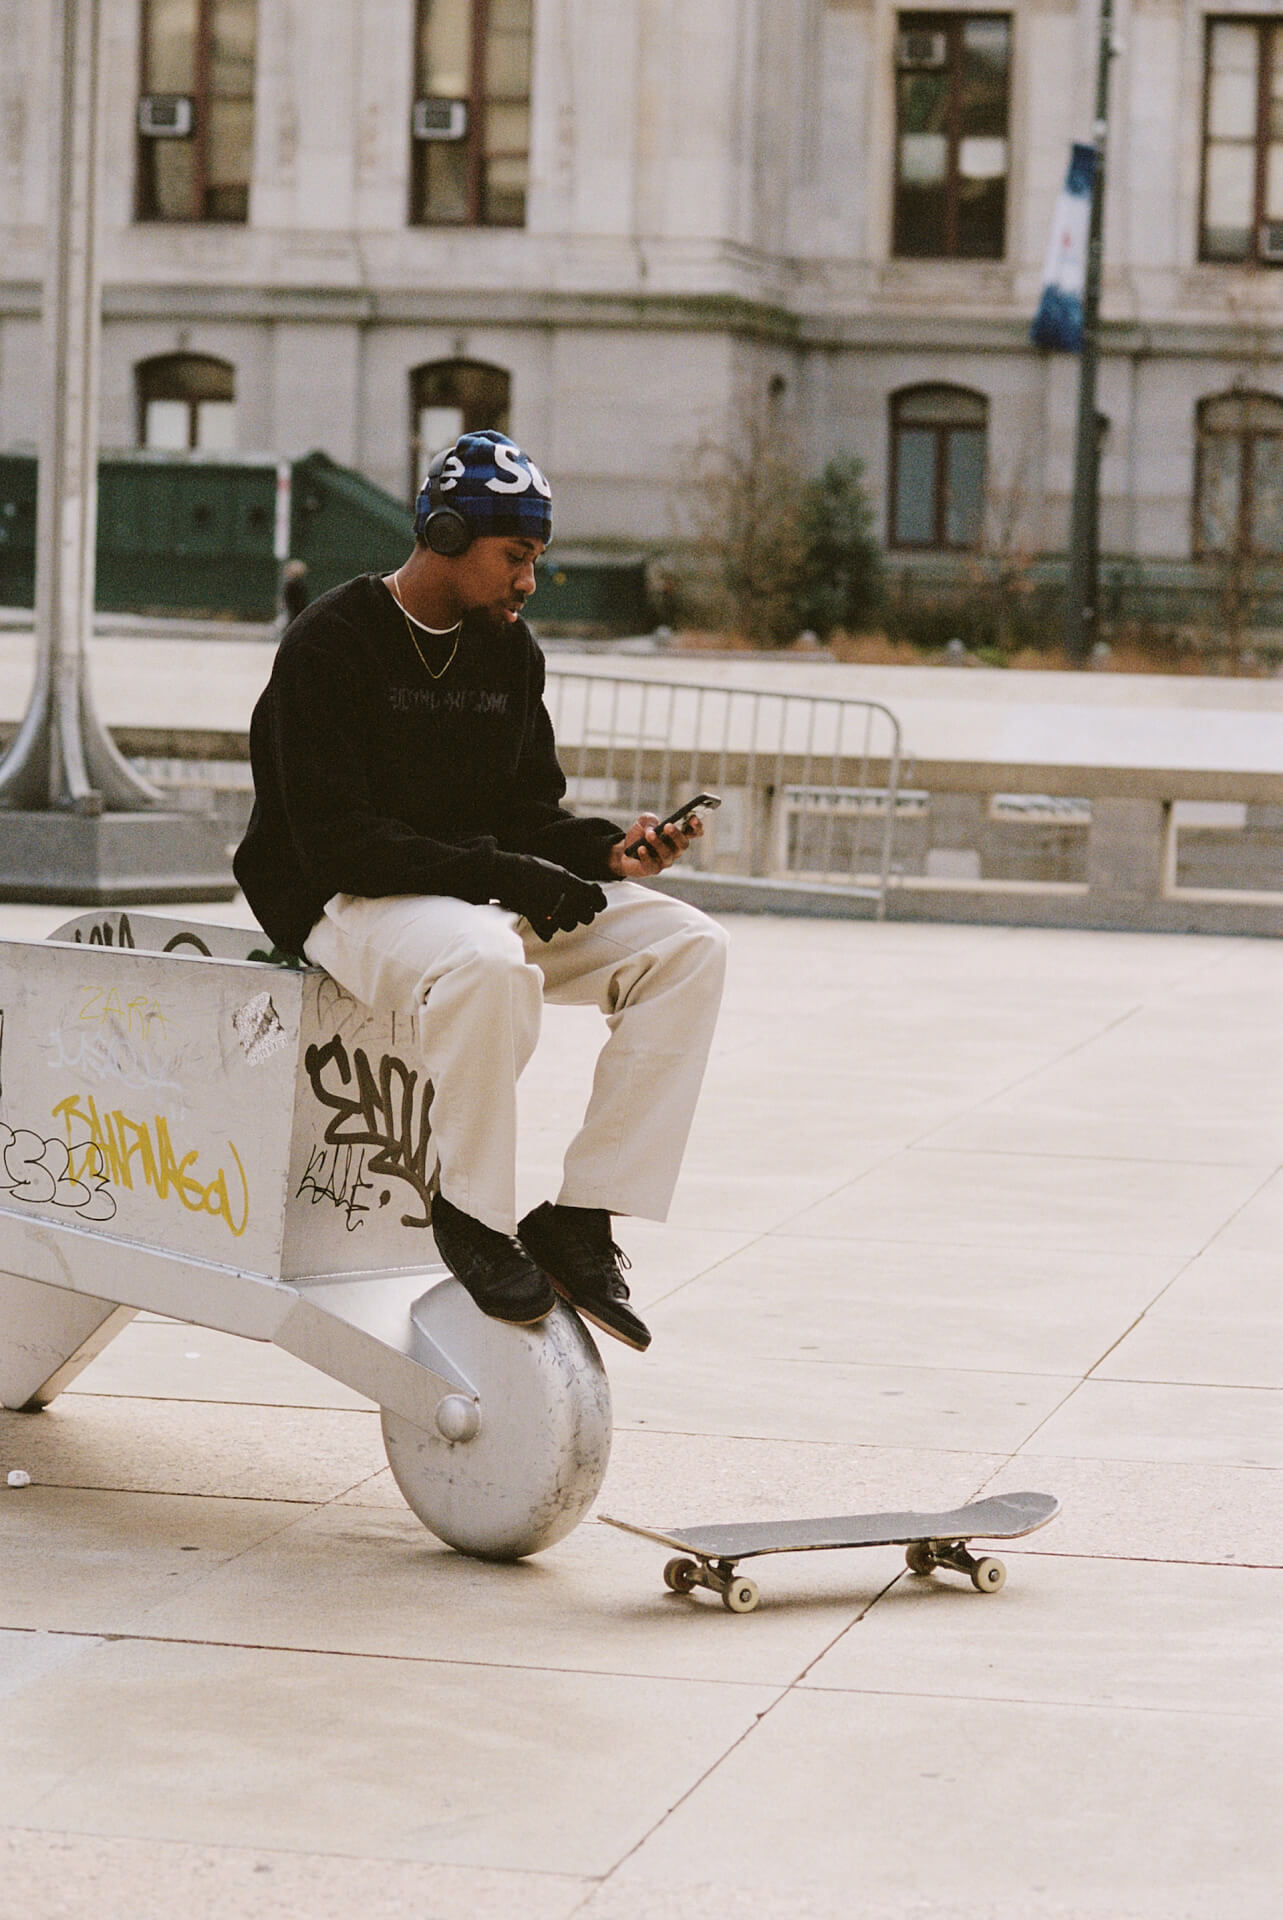 adidas Skateboarding「FORUM 84 ADV」に春夏仕様の新色が登場!チョークホワイト&ブラックの2色 life210324_adidasskateboarding_3